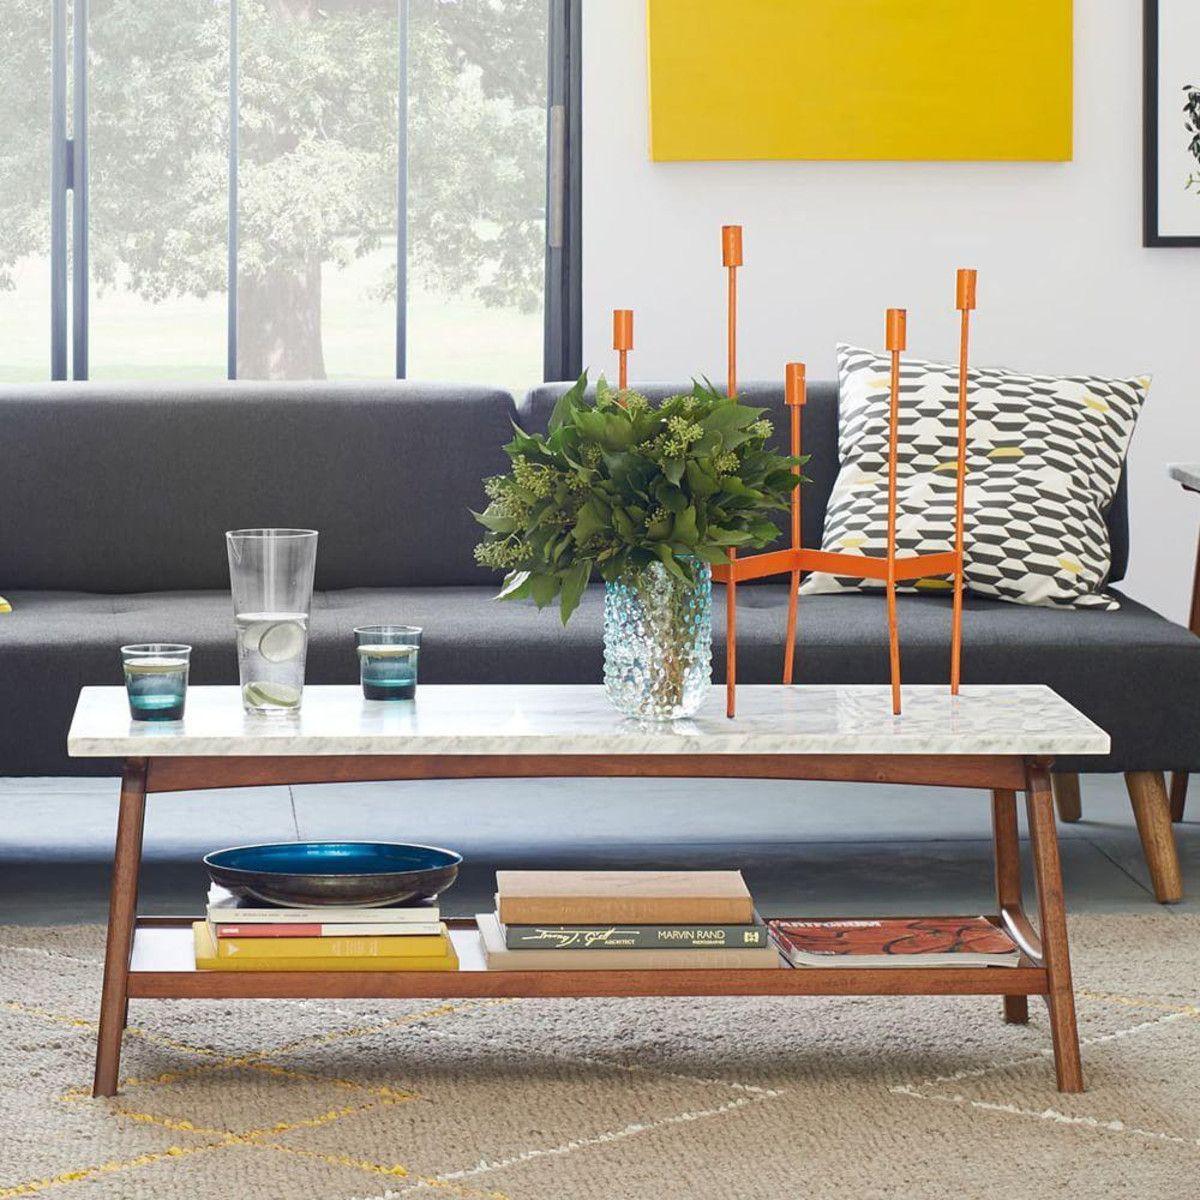 Reeve Mid Century Rectangular Coffee Table Mid Century Coffee Table Mid Century Modern Coffee Table Coffee Table [ 1200 x 1200 Pixel ]